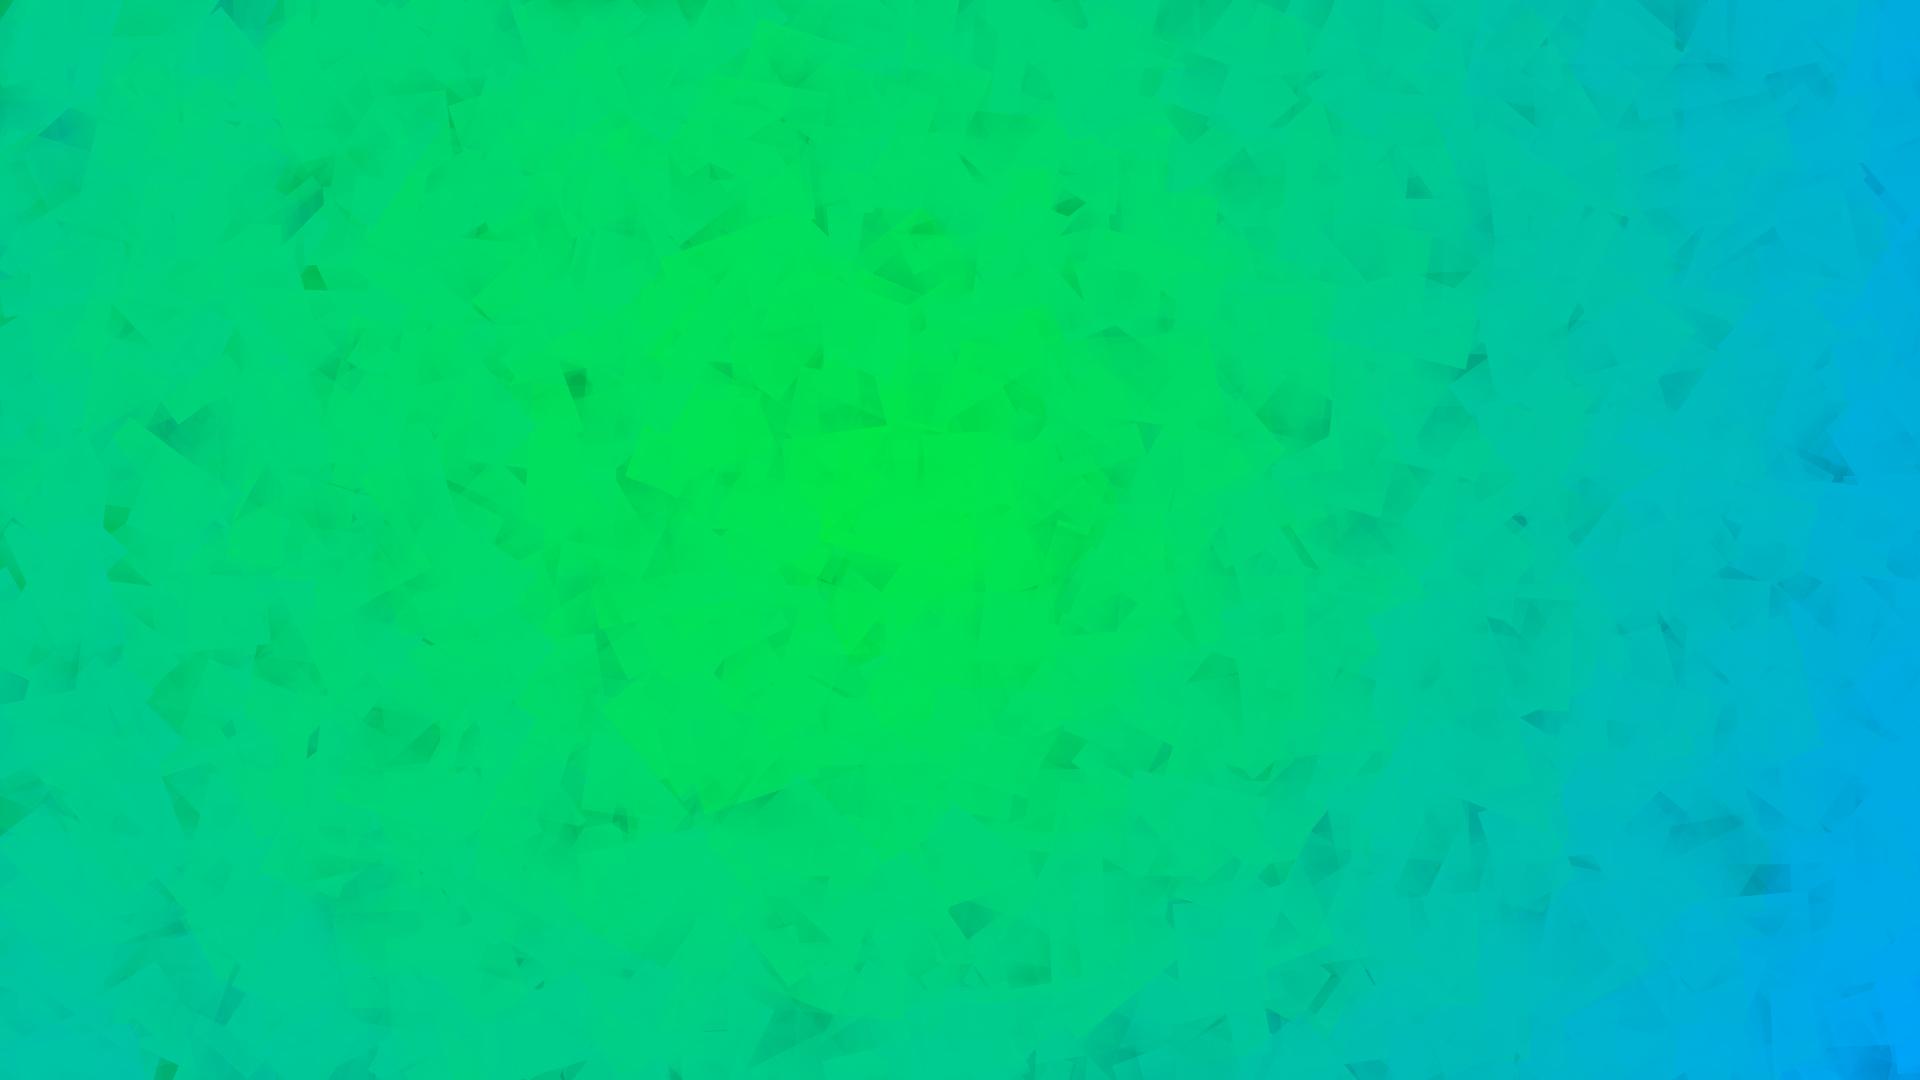 Verde Full Hd Fondo De Pantalla And Fondo De Escritorio: Green 4k Ultra HD Wallpaper